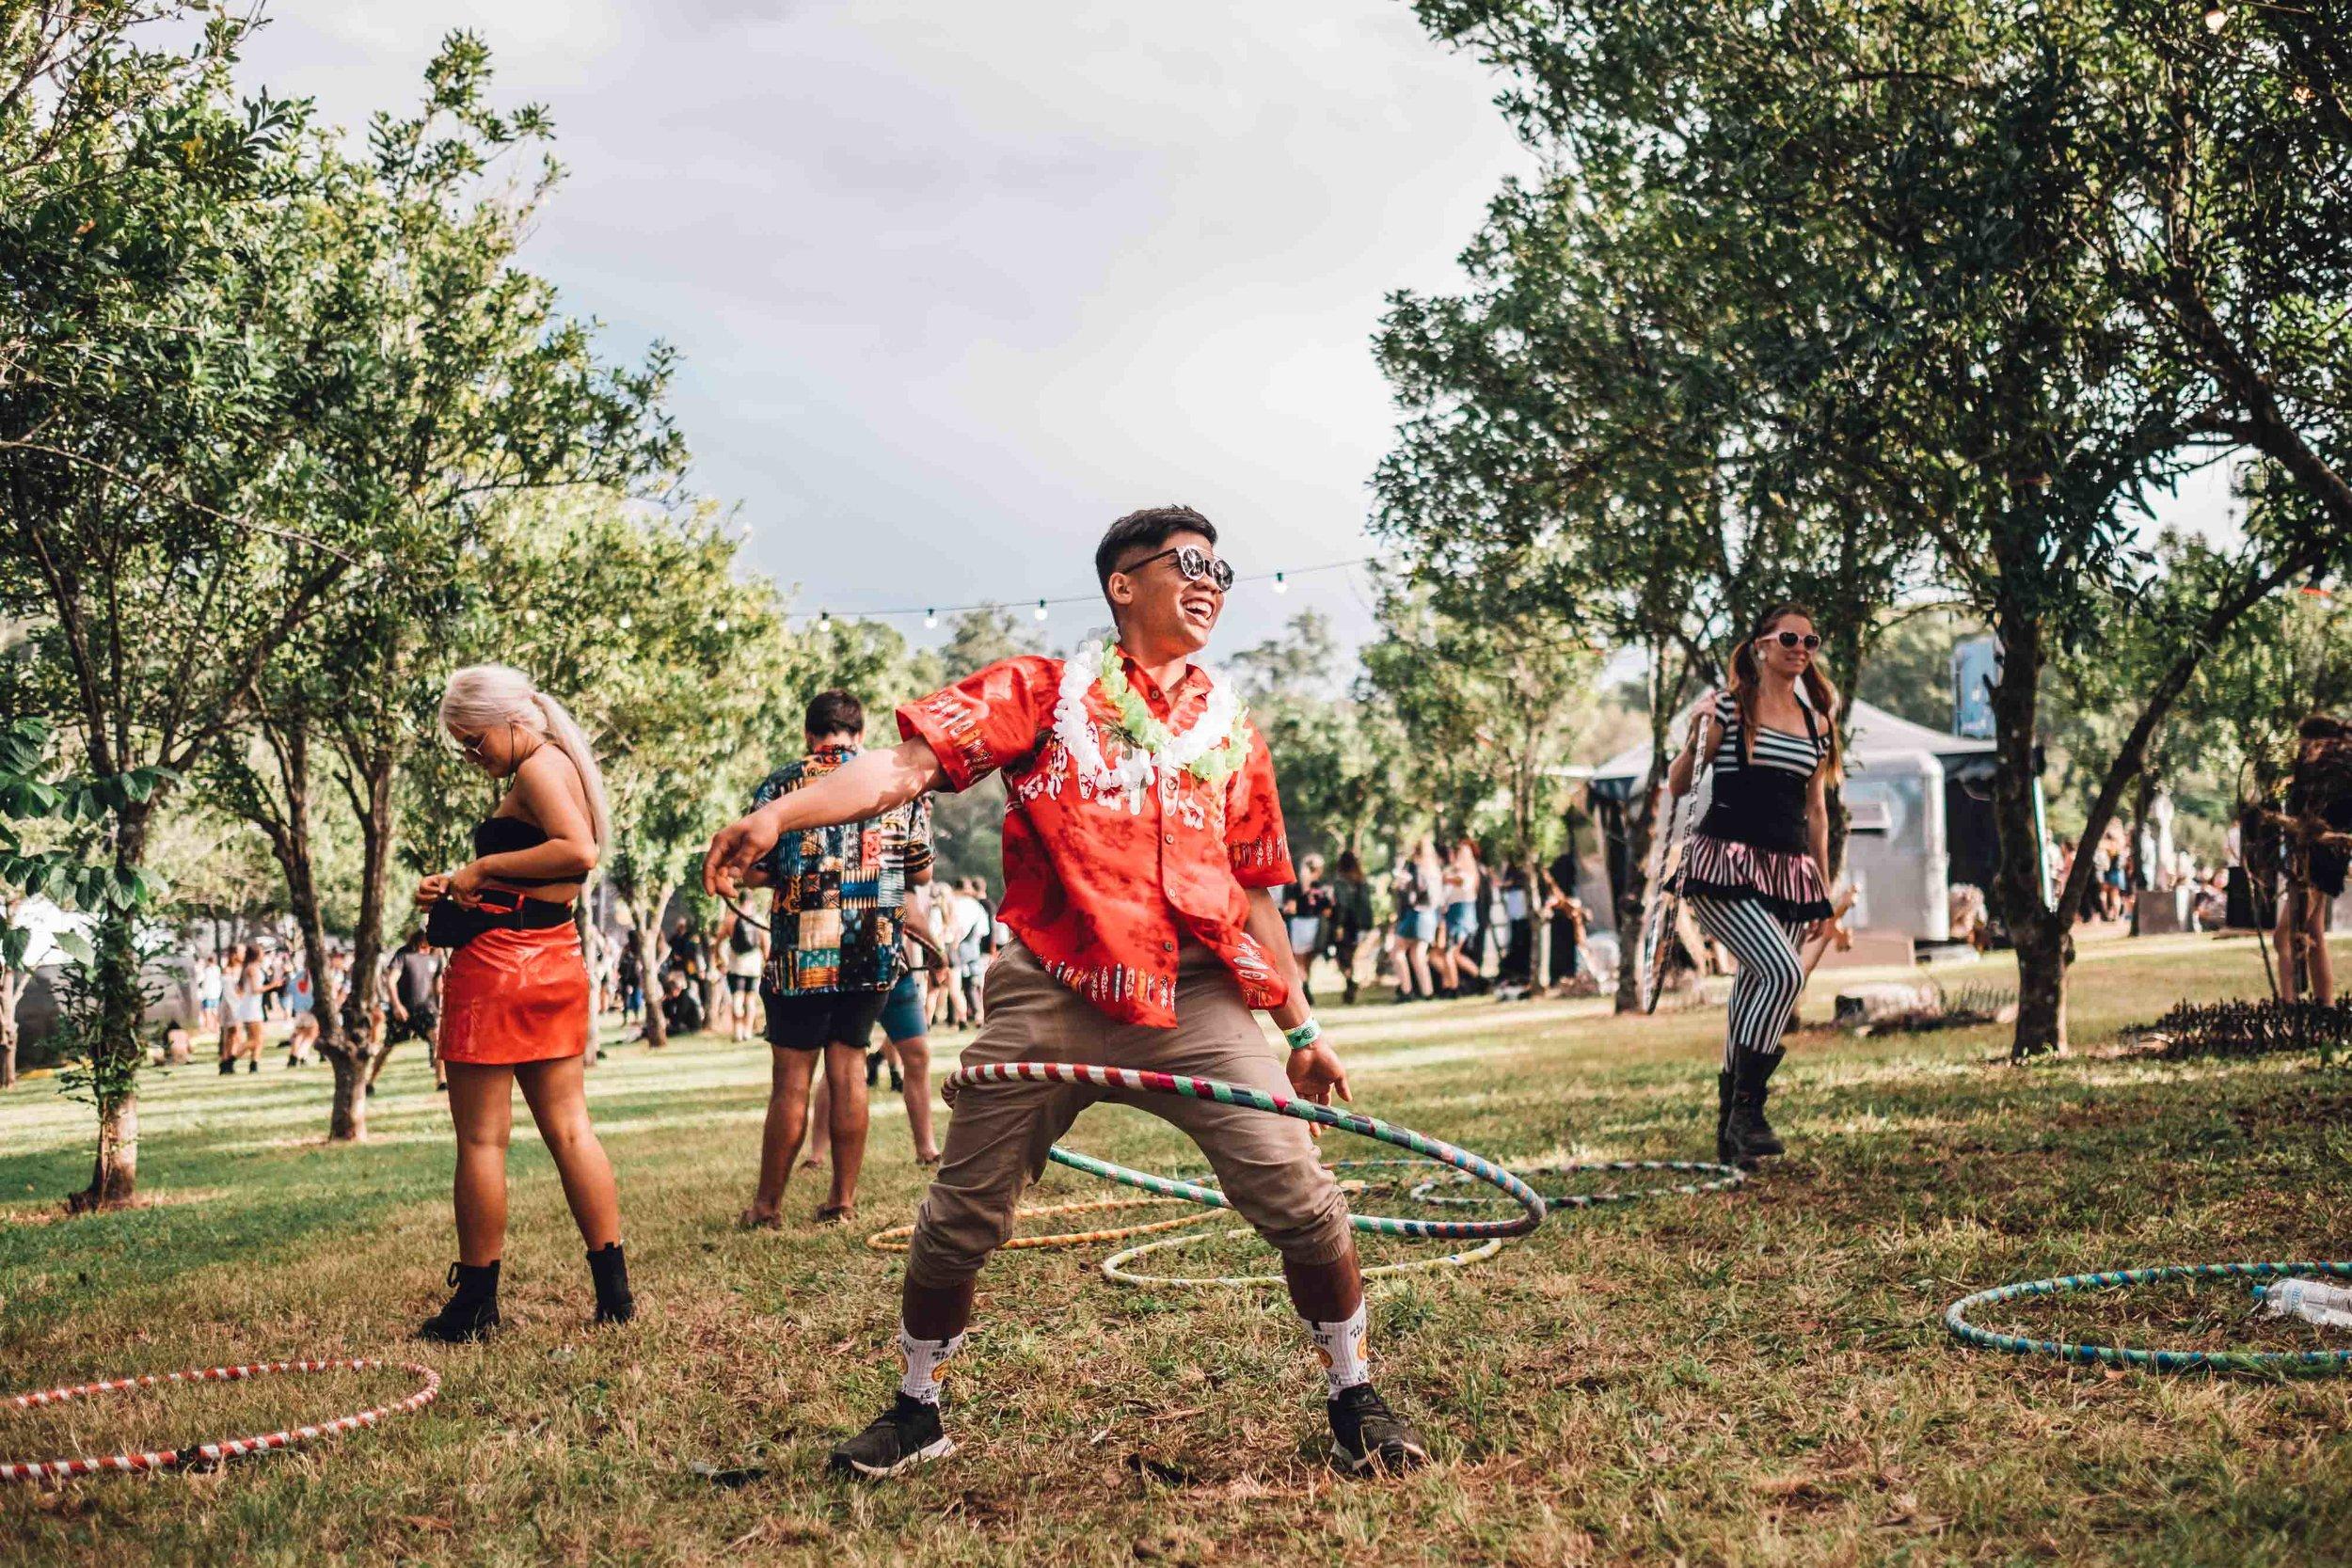 BIG PINEAPPLE MUSIC FESTIVAL -